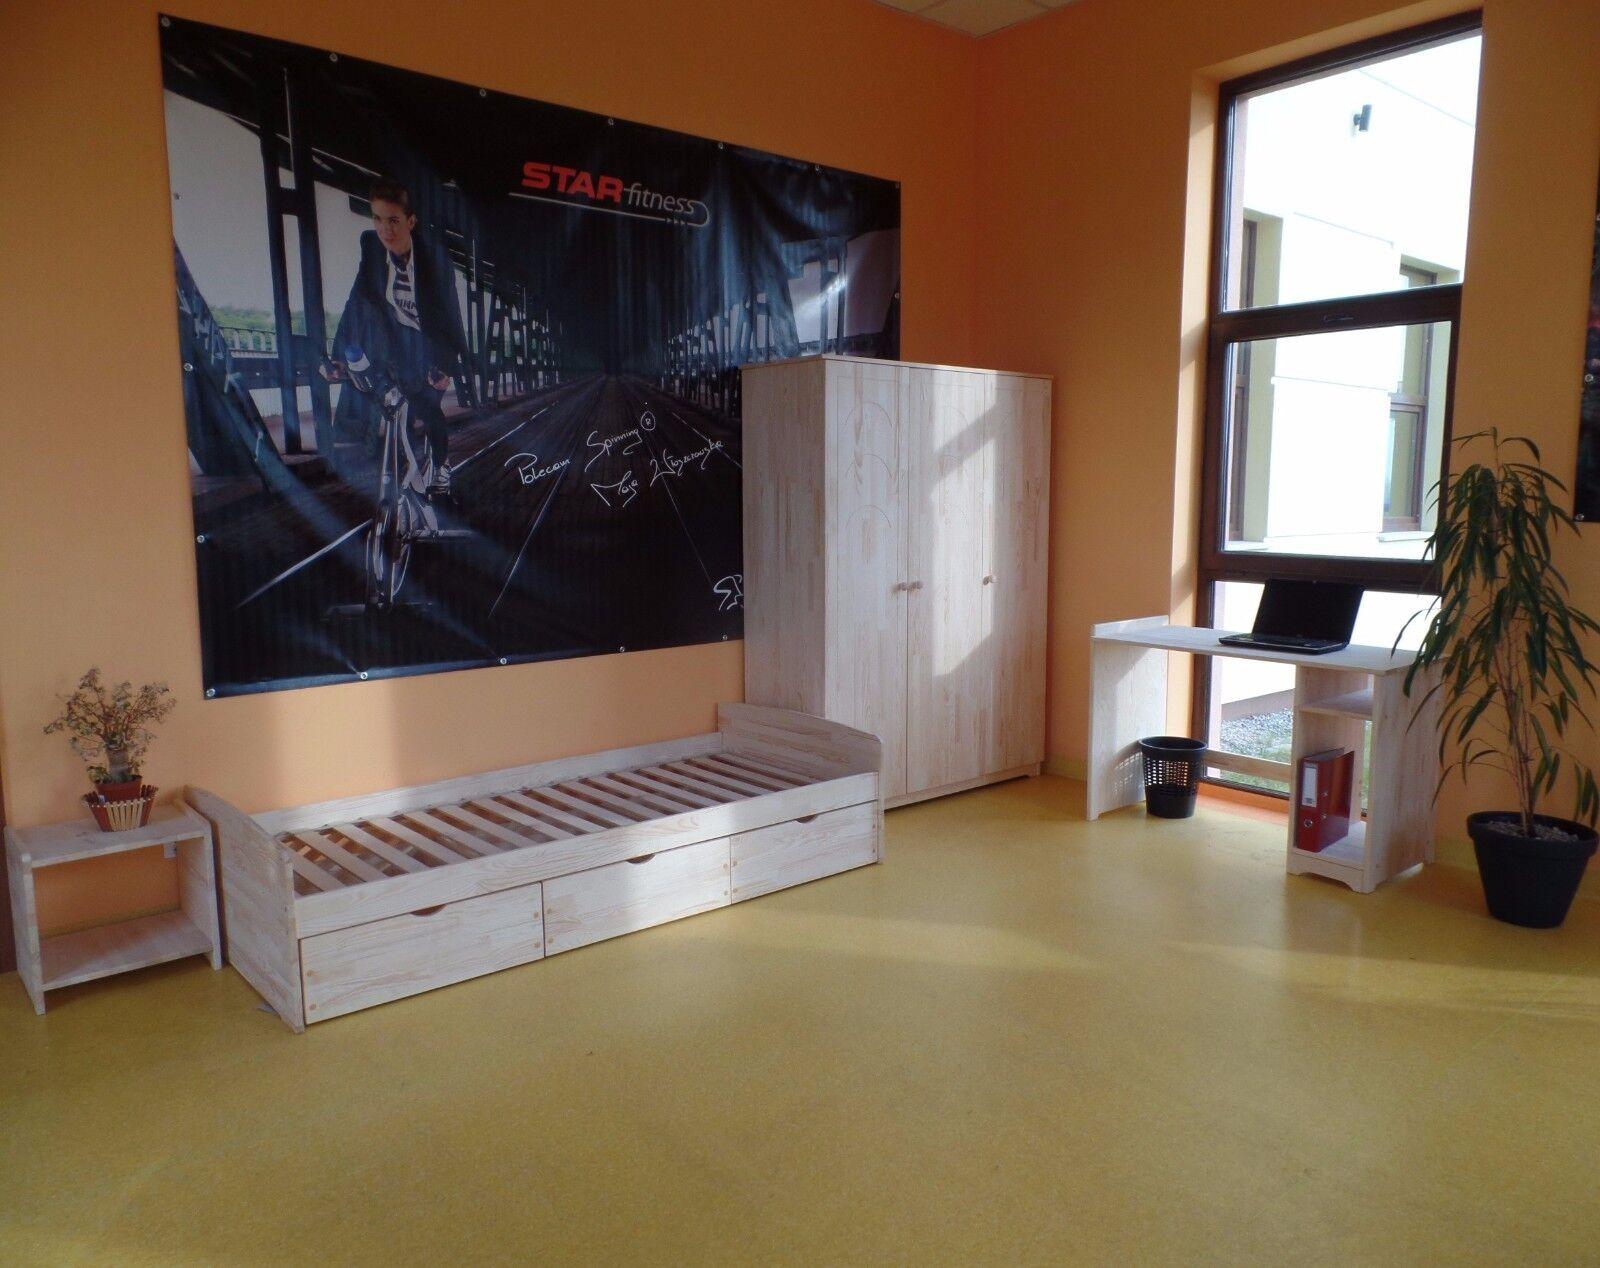 funktionsbett einzelbett kojenbett jugendbett 100x200. Black Bedroom Furniture Sets. Home Design Ideas